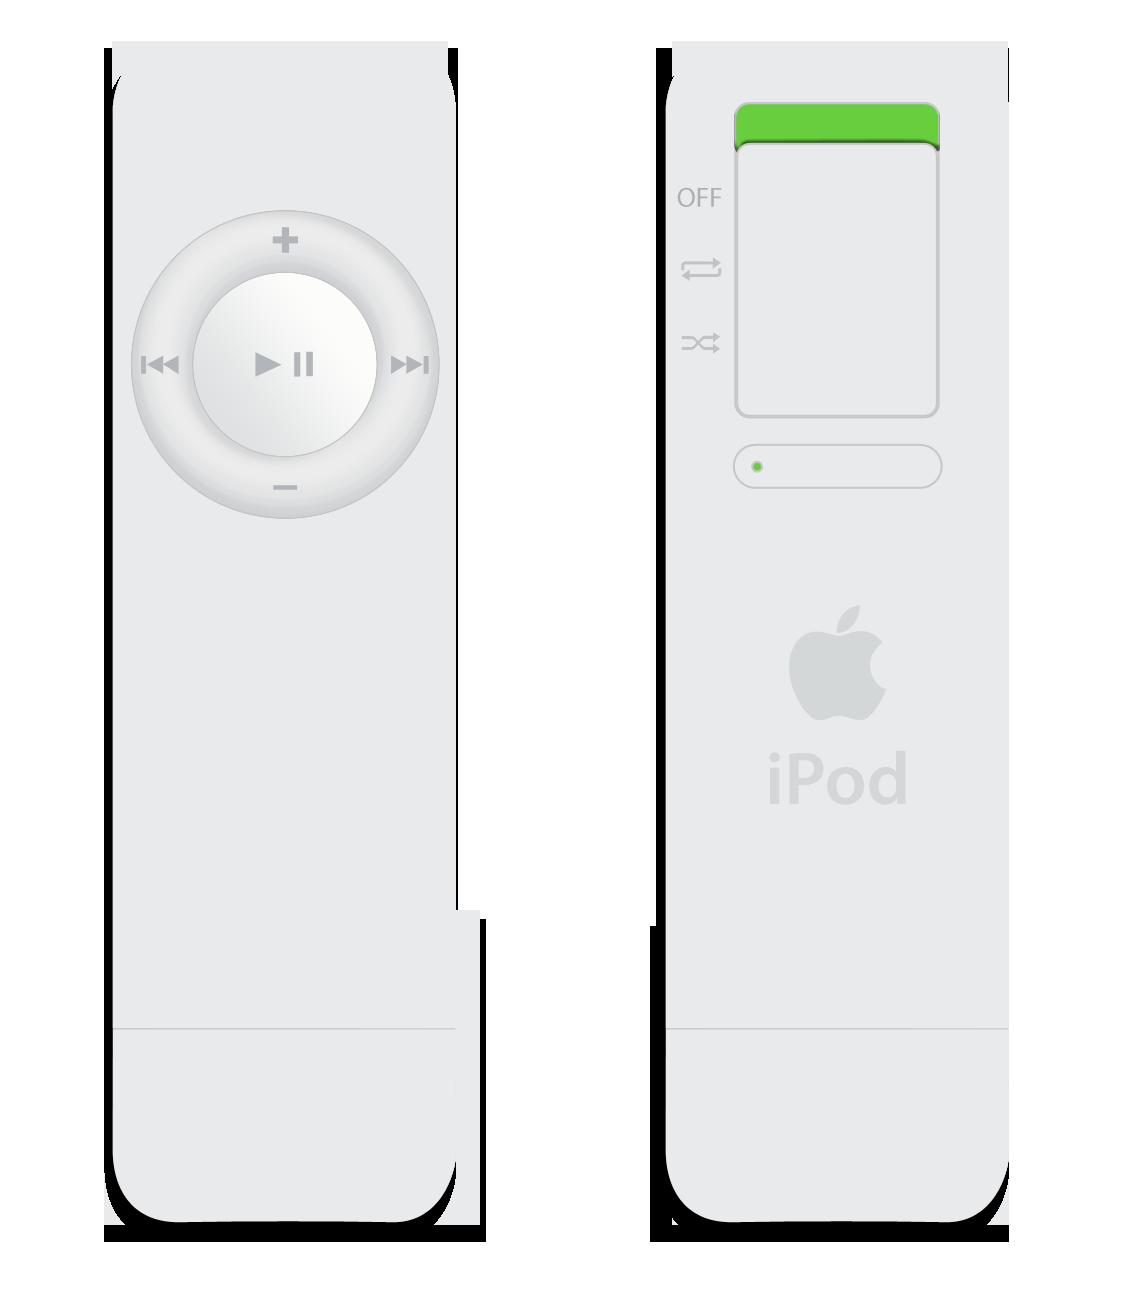 apple ipod shuffle 512mb reuse repair recycle learn rh usedpcjob co uk 1 Generation iPod Shuffle Manual iPod Shuffle 7th Generation